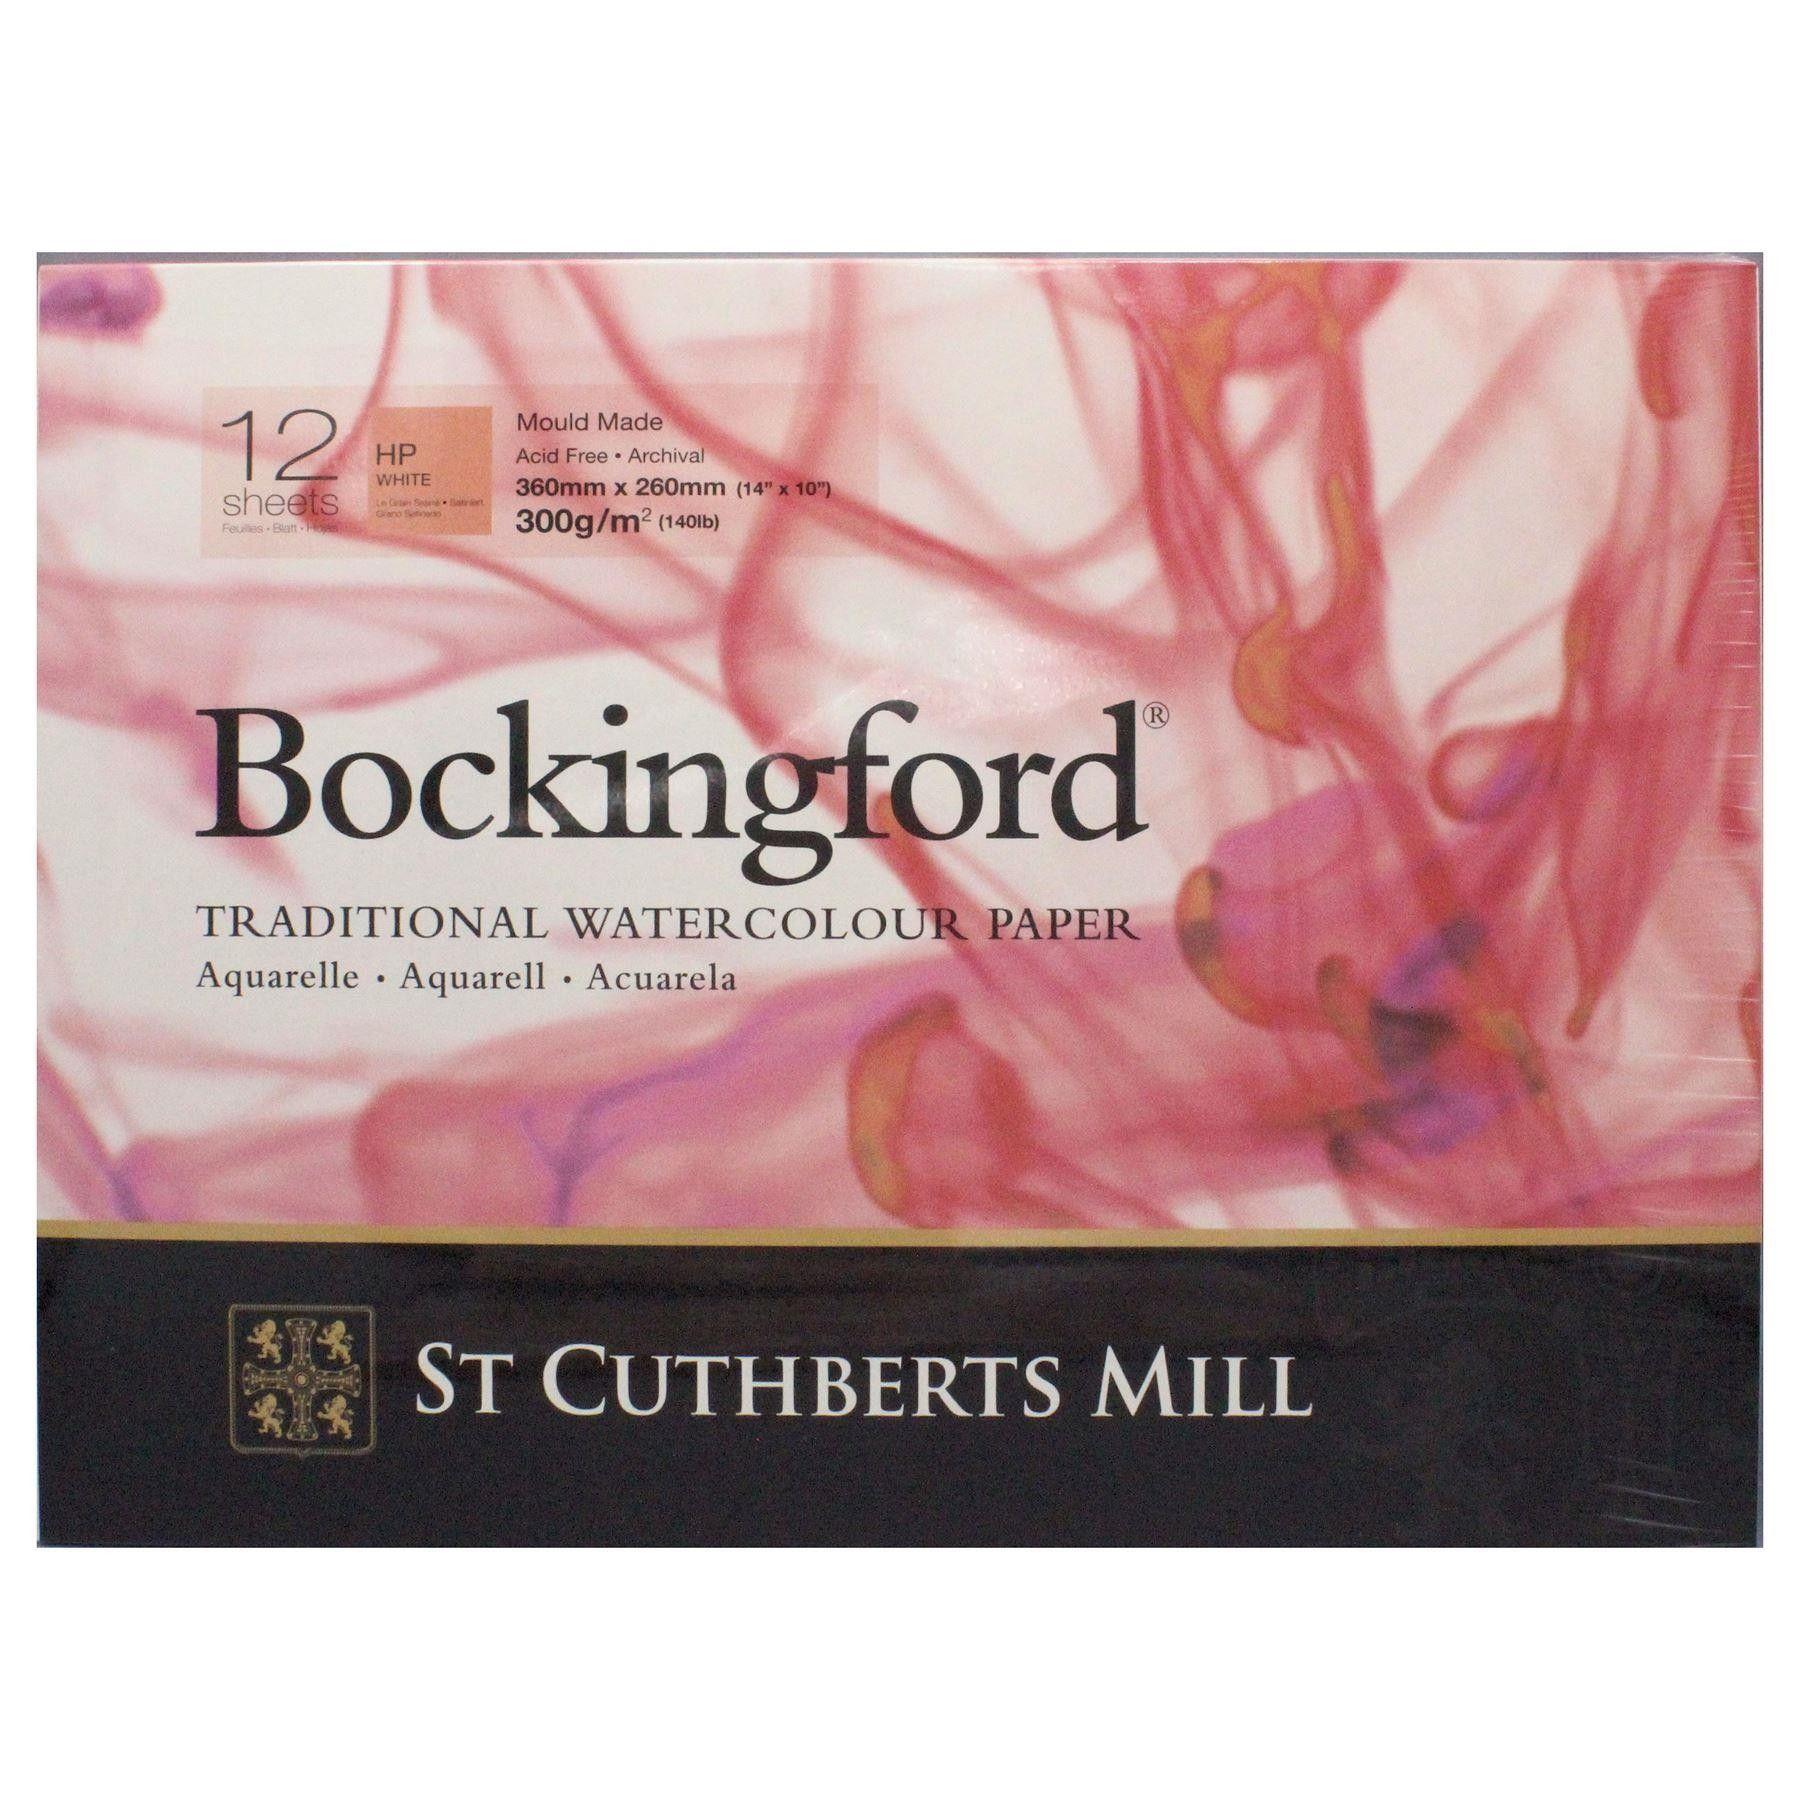 Bockingford Watercolour Pad Gummed Paper 12 Sheets 14 X 10 Hot